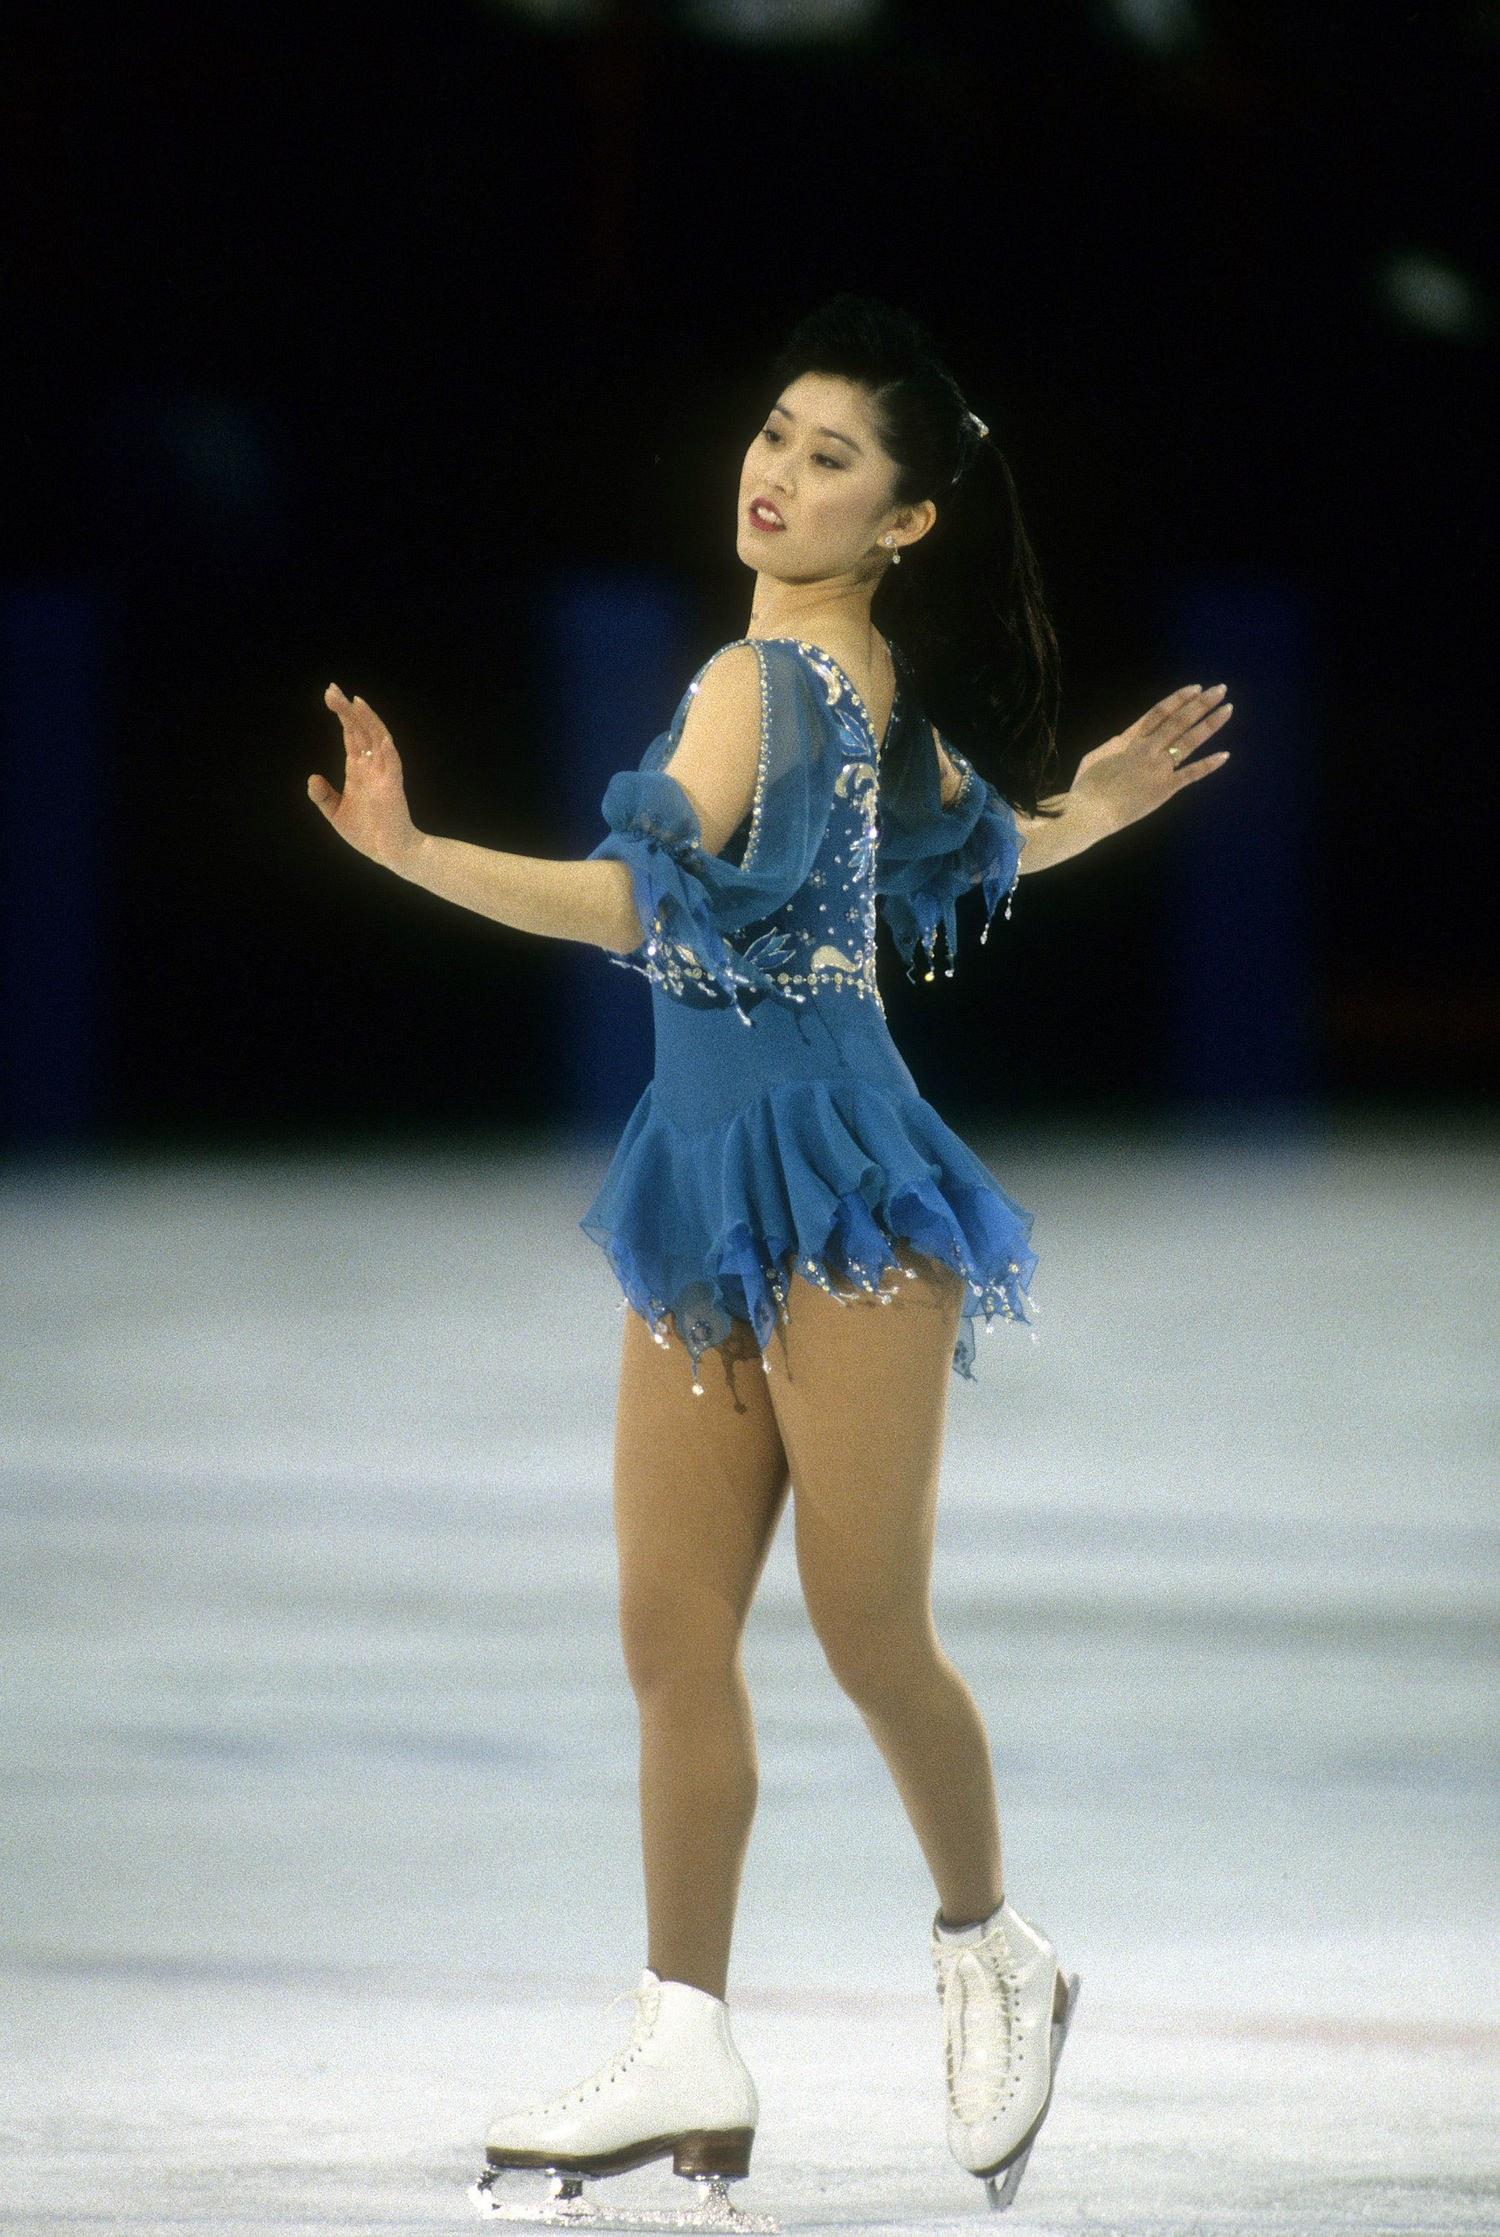 fashion-2014-02-04-olympic-ice-skating-costume-kristi-yamaguchi-main.jpg